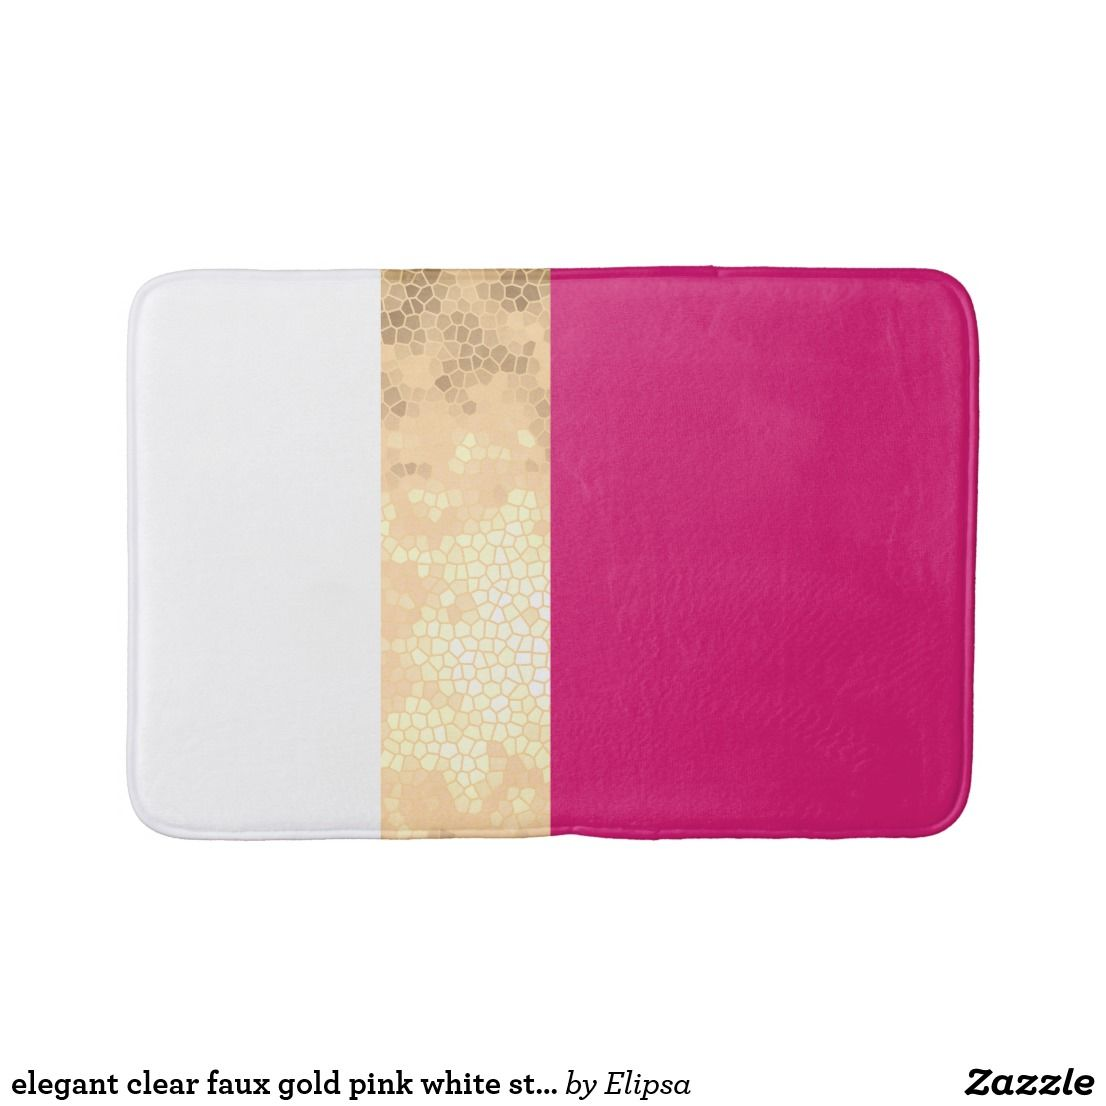 Elegant Clear Faux Gold Pink White Stripes Bath Mat Zazzle Com